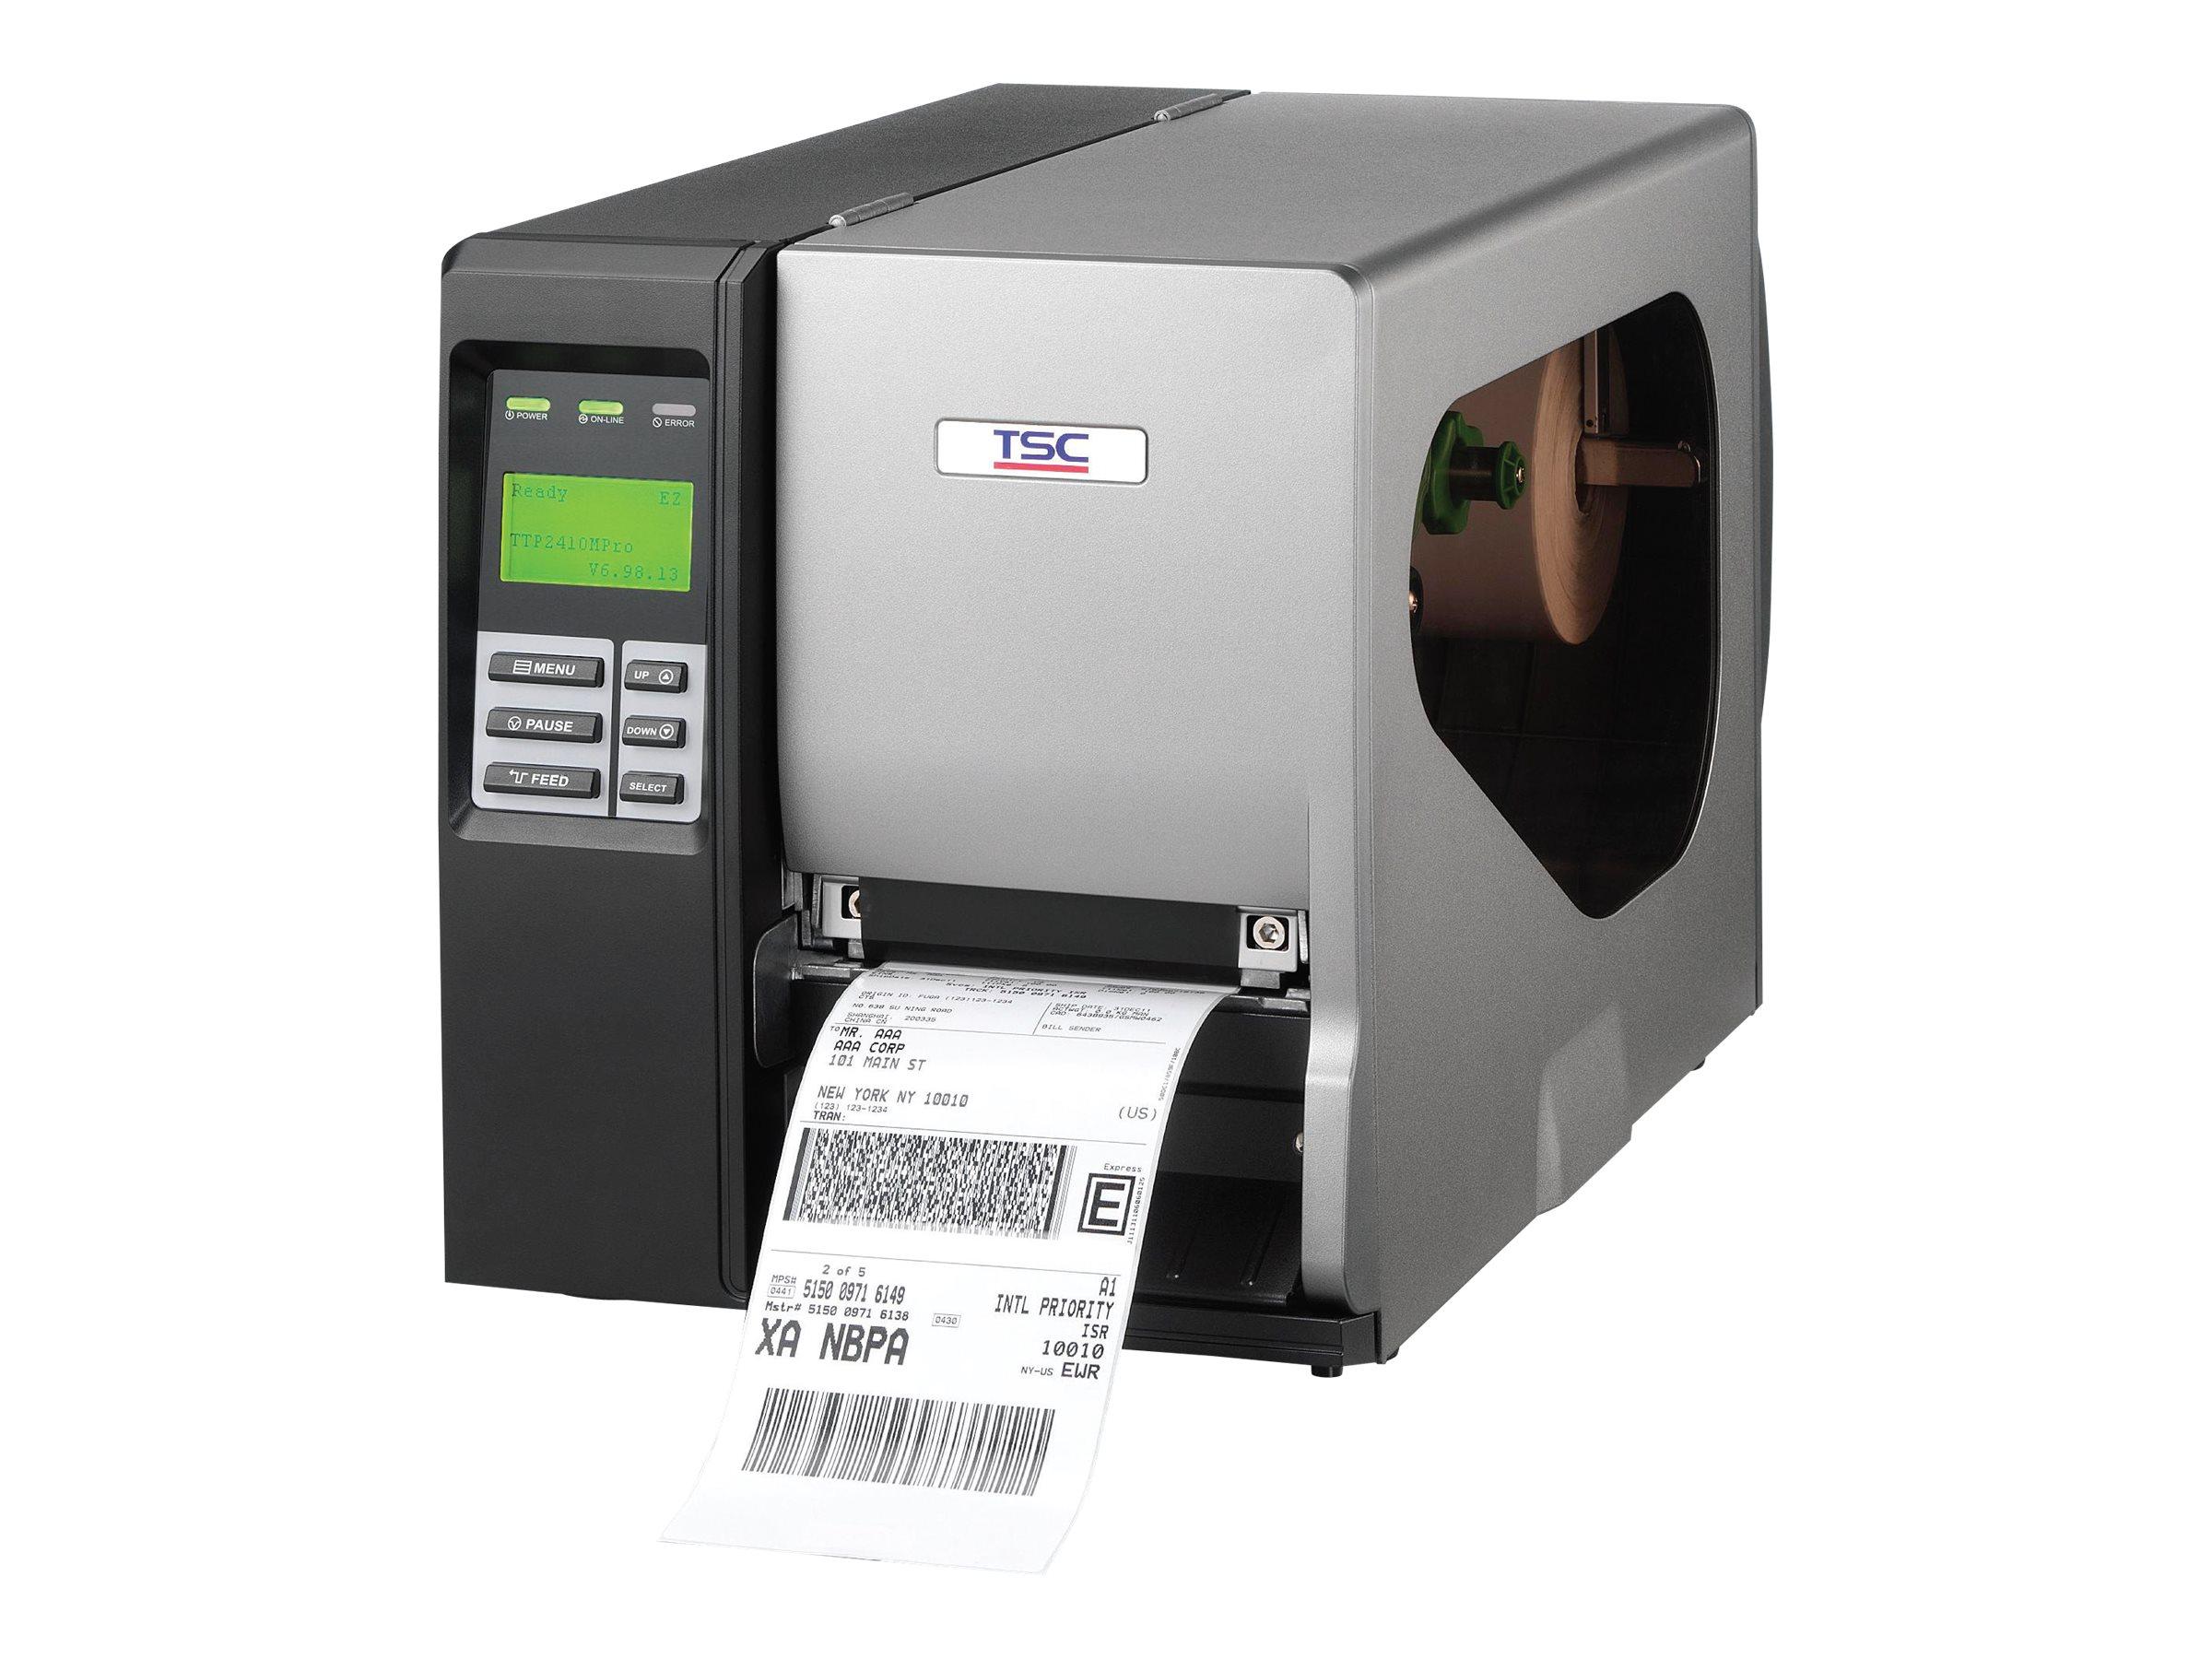 TSC TTP-344M Pro - Etikettendrucker - TD/TT - Rolle (11,8 cm)